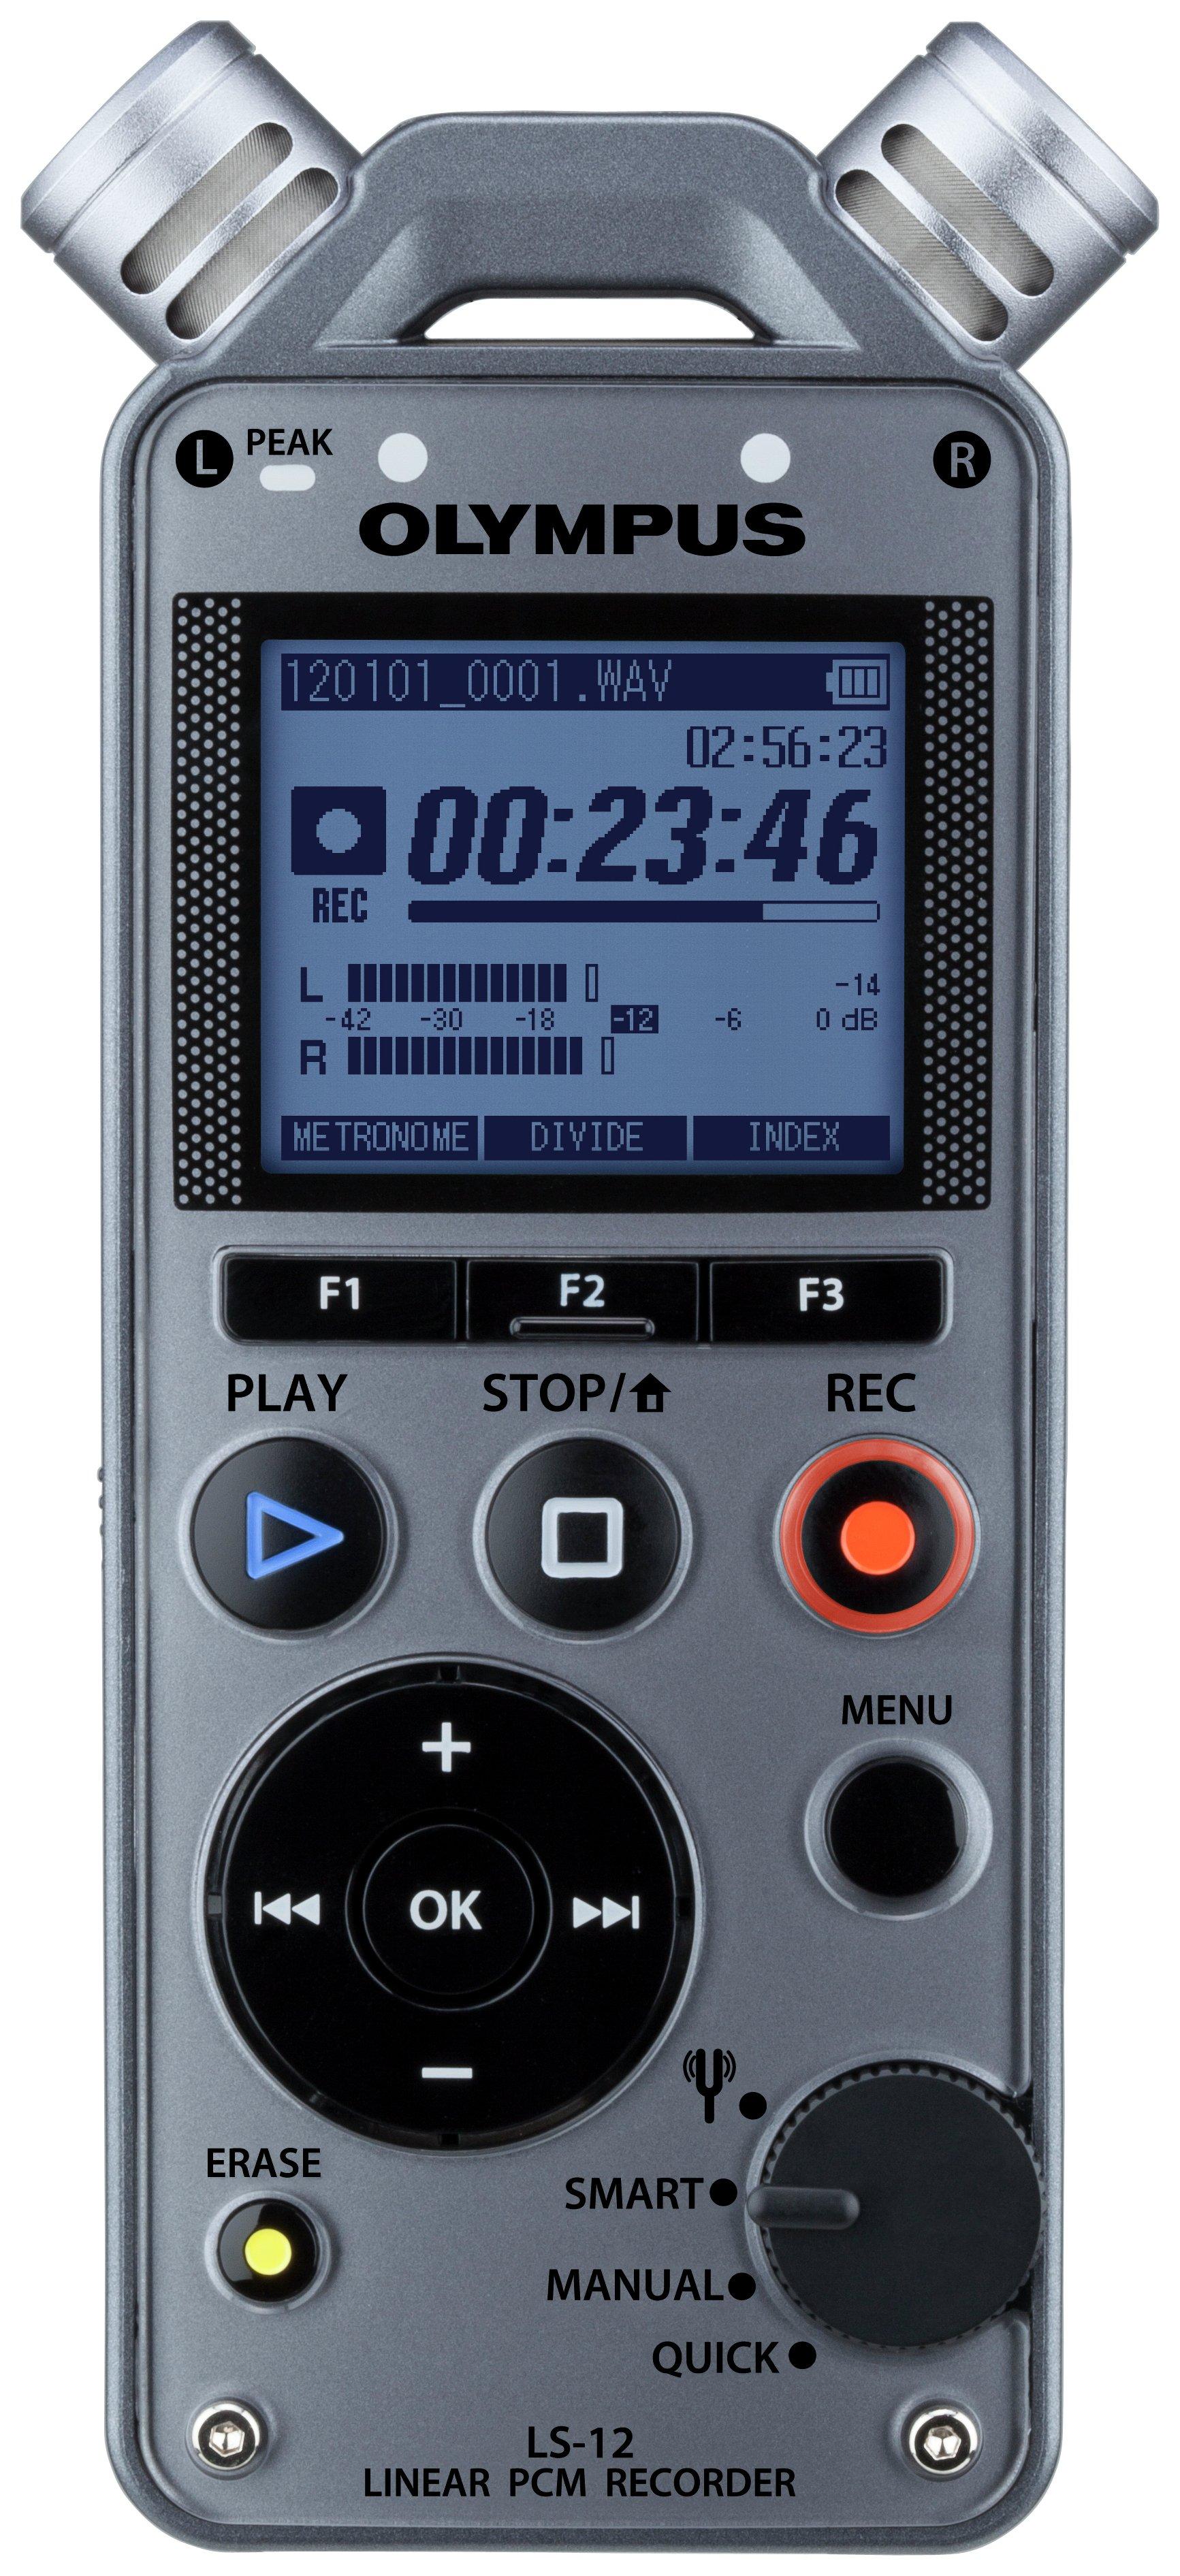 Olympus Olympus LS-12 Linear PCM Recorder.